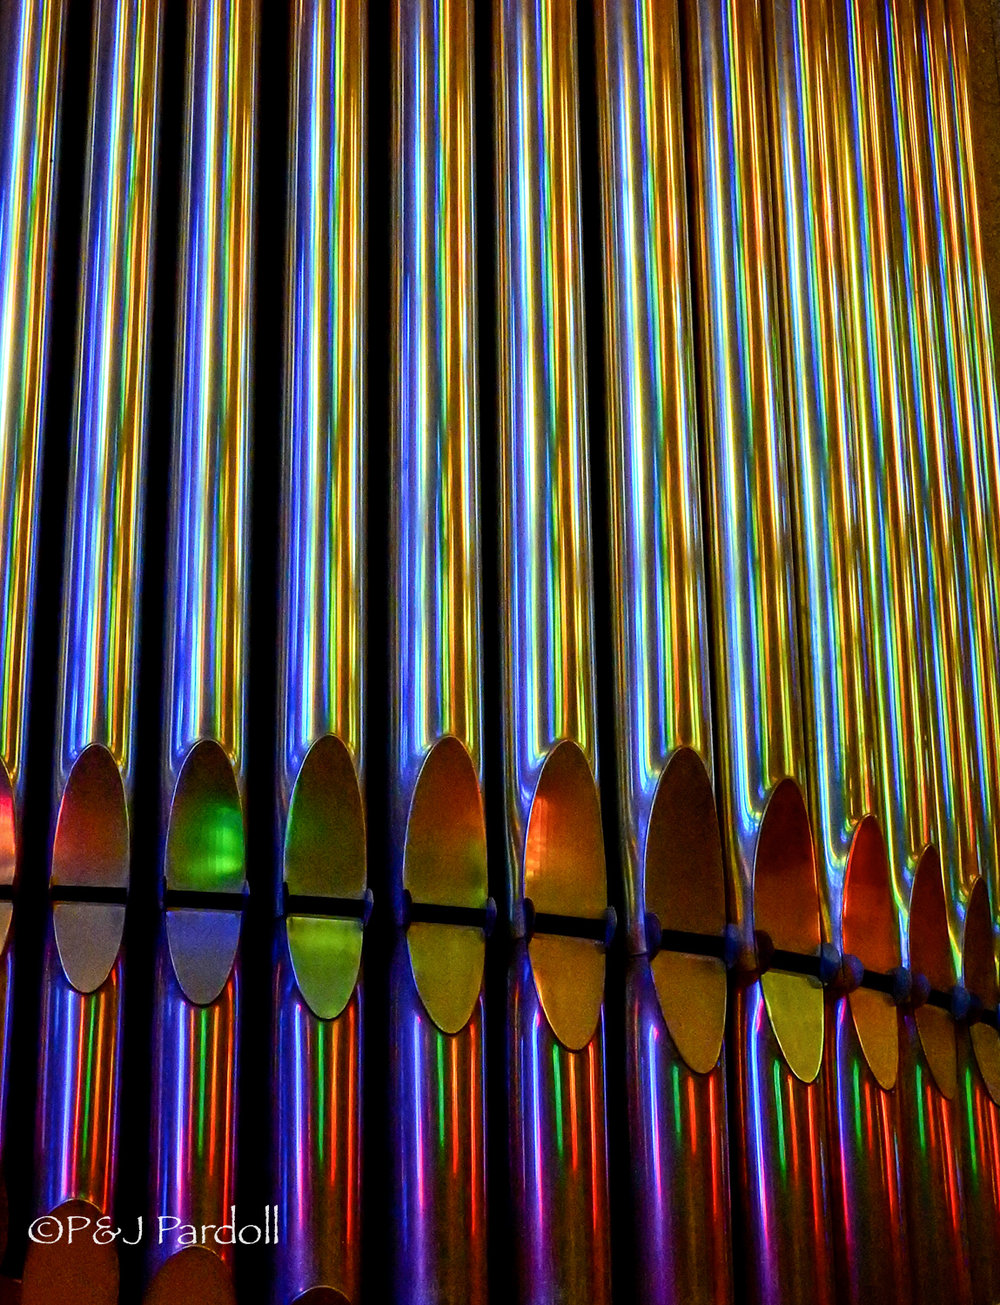 Organ Pipes in La Sagrada Familia